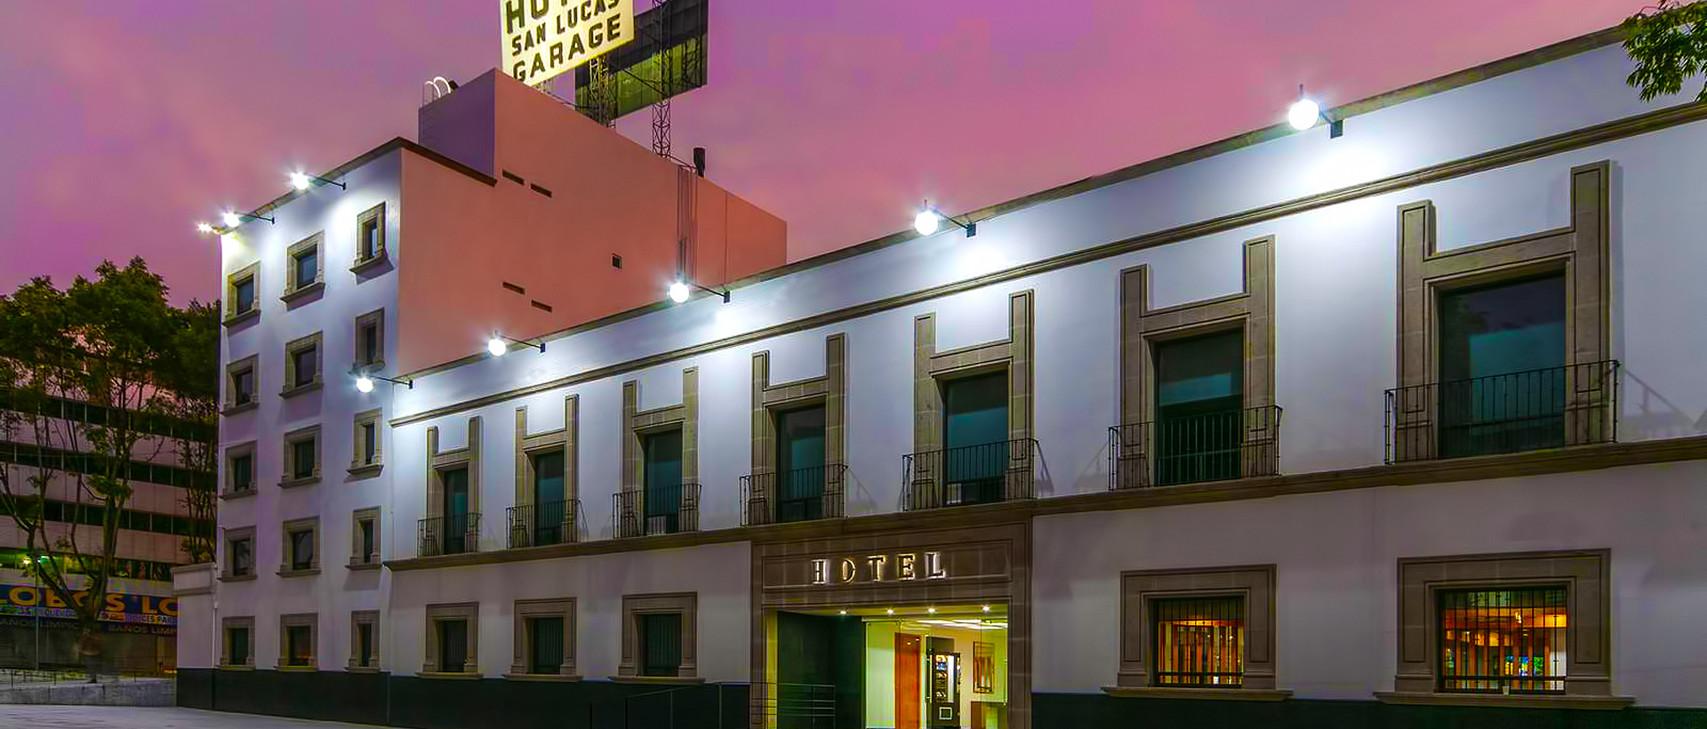 Hotel San Lucas